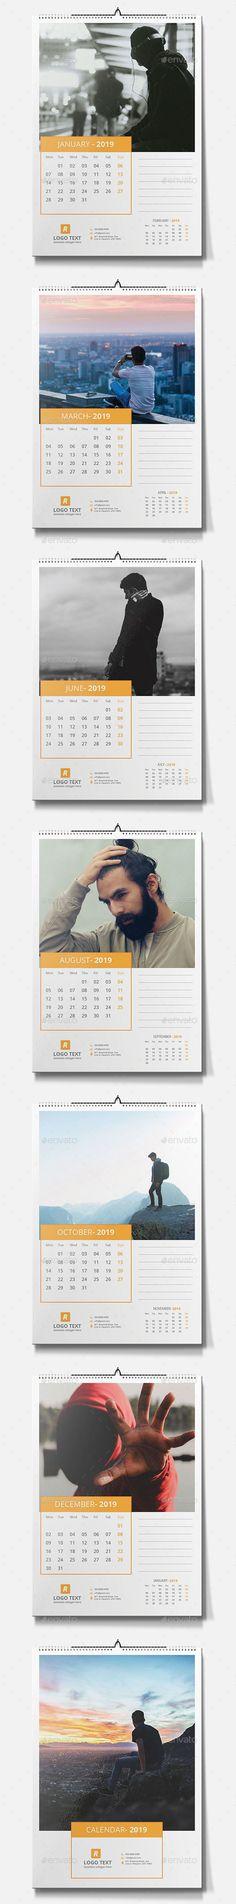 Calendar 2019 Template Vector EPS, InDesign INDD, AI Illustrator